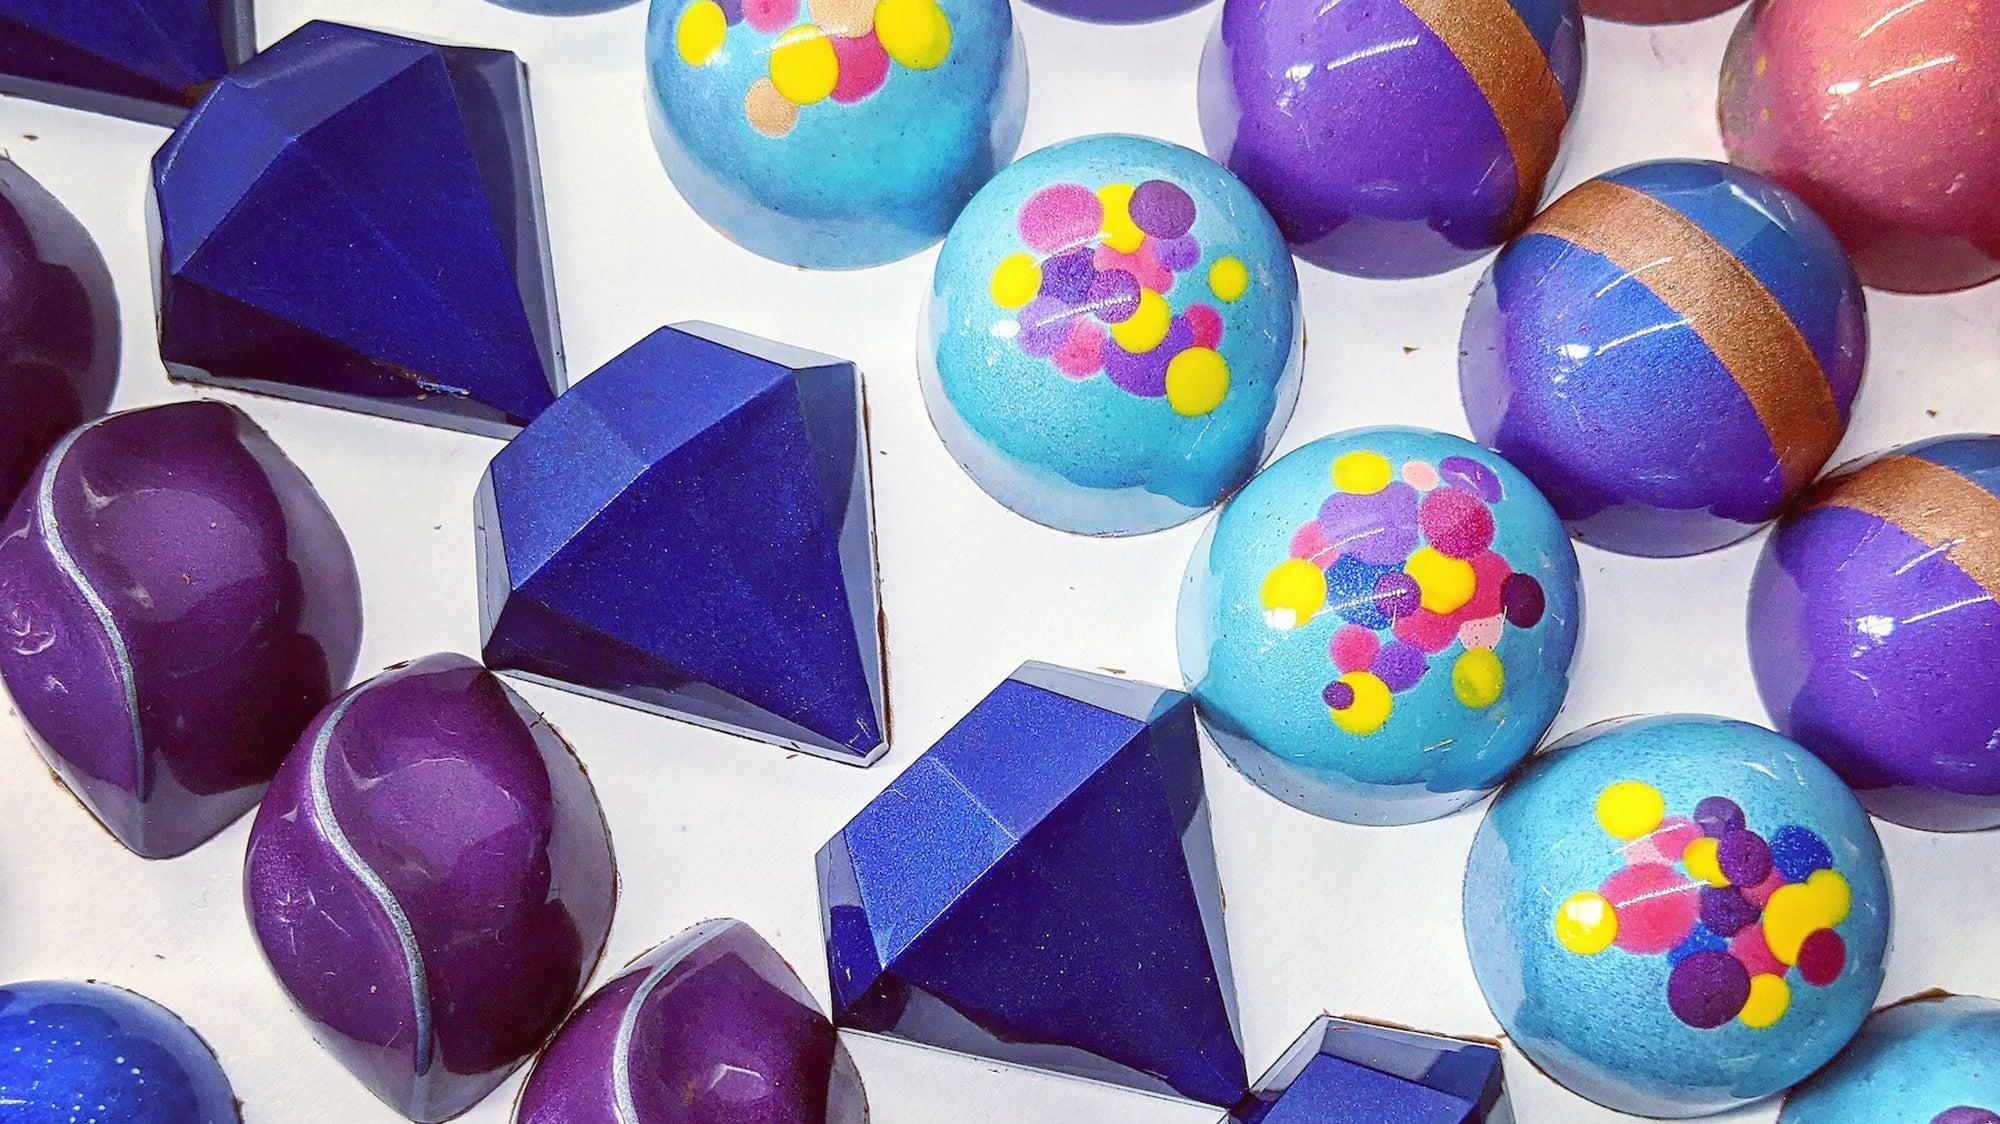 ChocAllure bonbons